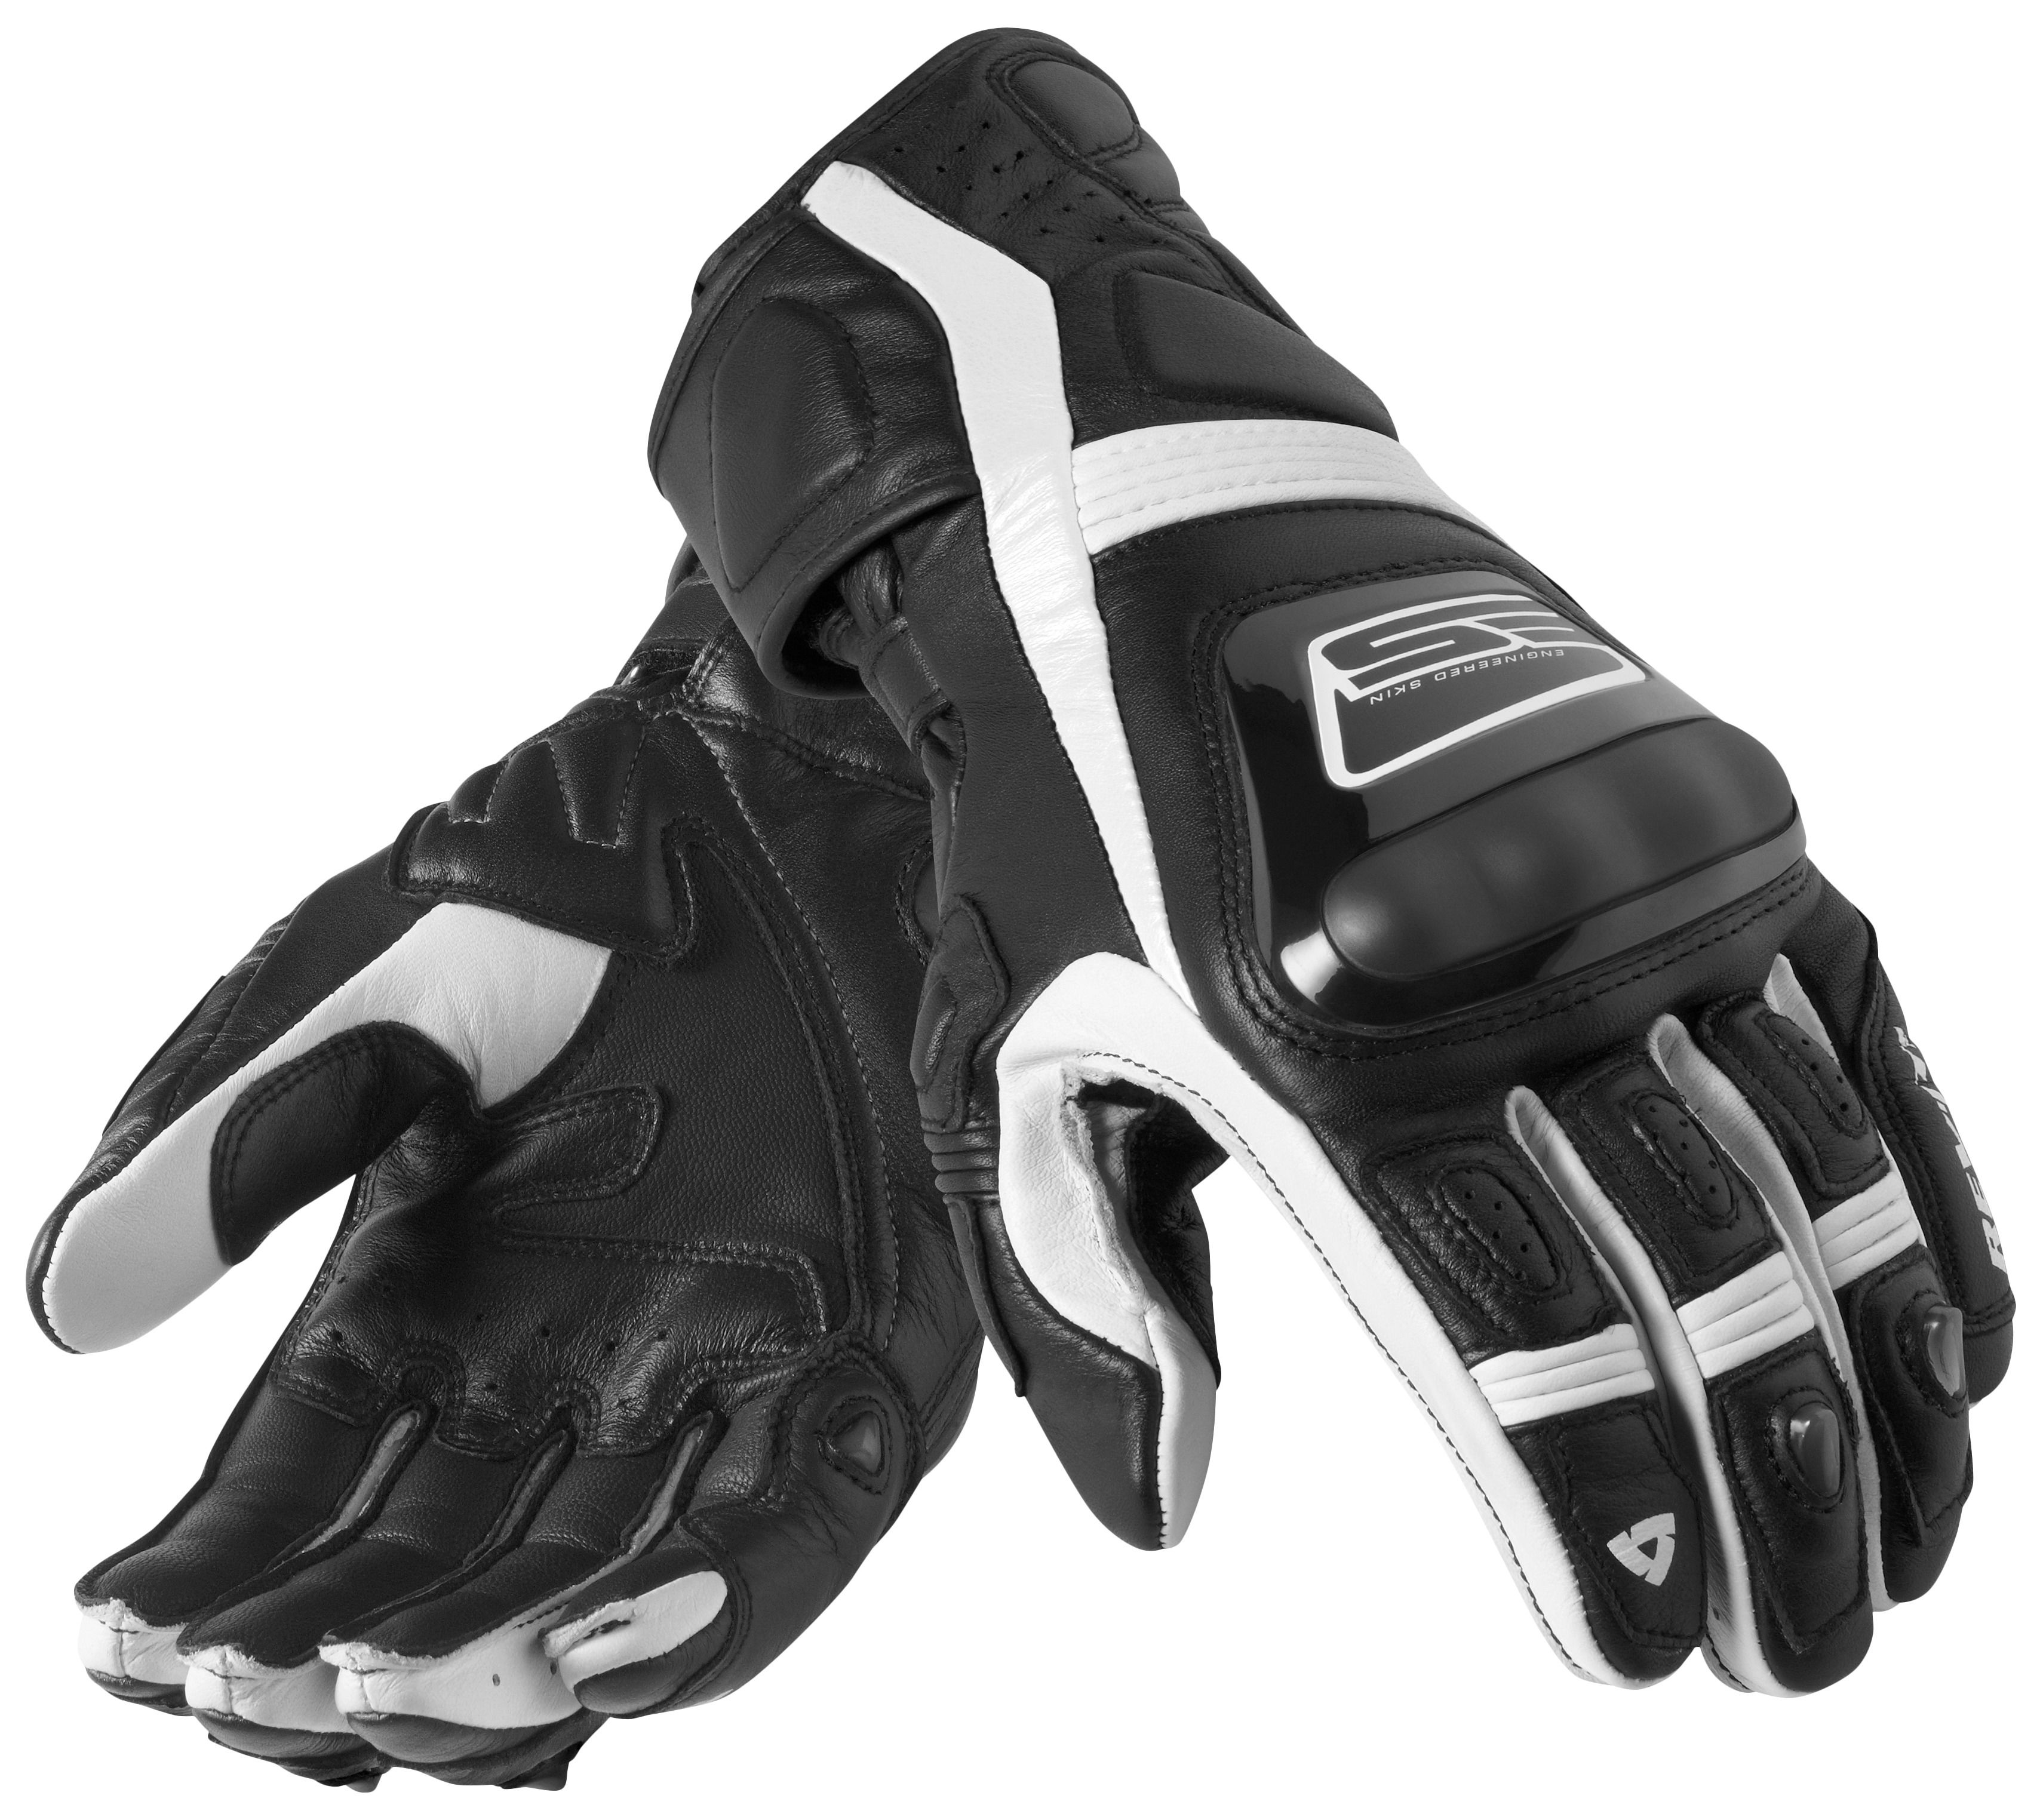 Motorcycle gloves double cuff - Stellar Gloves Revzilla